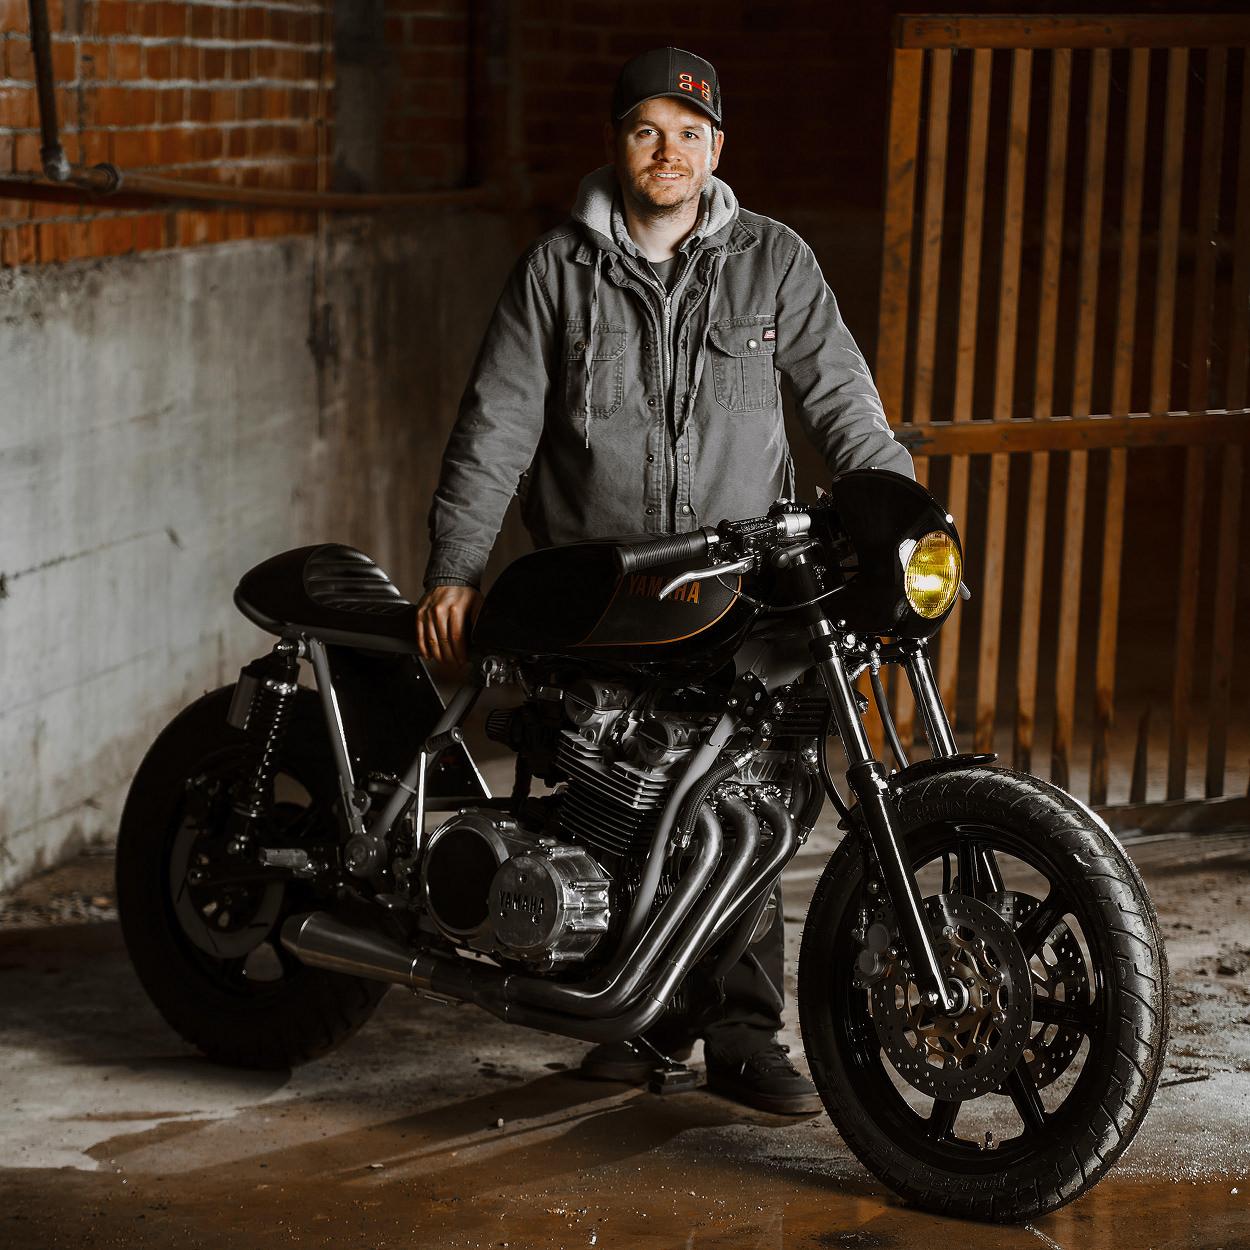 Yamaha XS850 Restomod by Brick House Builds – BikeBound